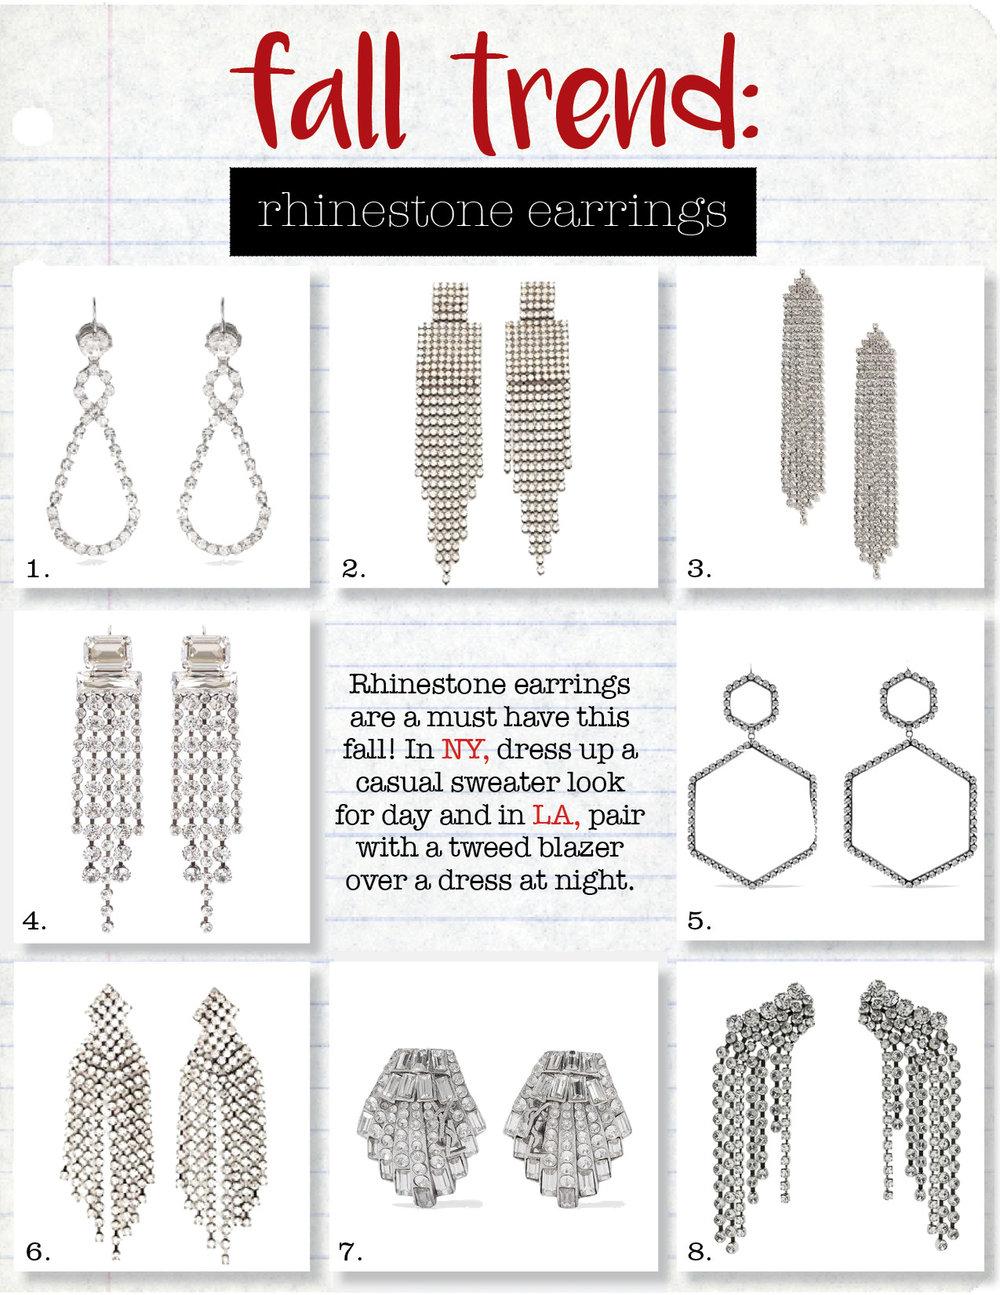 1. miu miu crystal-encrusted drop earrings, $277,  matchesfashion.com  2. jennifer behr lorraine earrings, $425,  shopbop.com  3. topshop cupchain drape drop earrings, $22,  topshop.com  4. isabel marant crystal-embellished earrings, $485,  mytheresa.com  5. isabel marant silver-tone crystal earrings, $495,  net-a-porter.com  6. kenneth jay lane earrings, $100,  shopbop.com  7. saint laurent silver-tone crystal clip earrings, $895,  net-a-porter.com  8. isabel marant crystal cascade earrings, $485,  fwrd.com